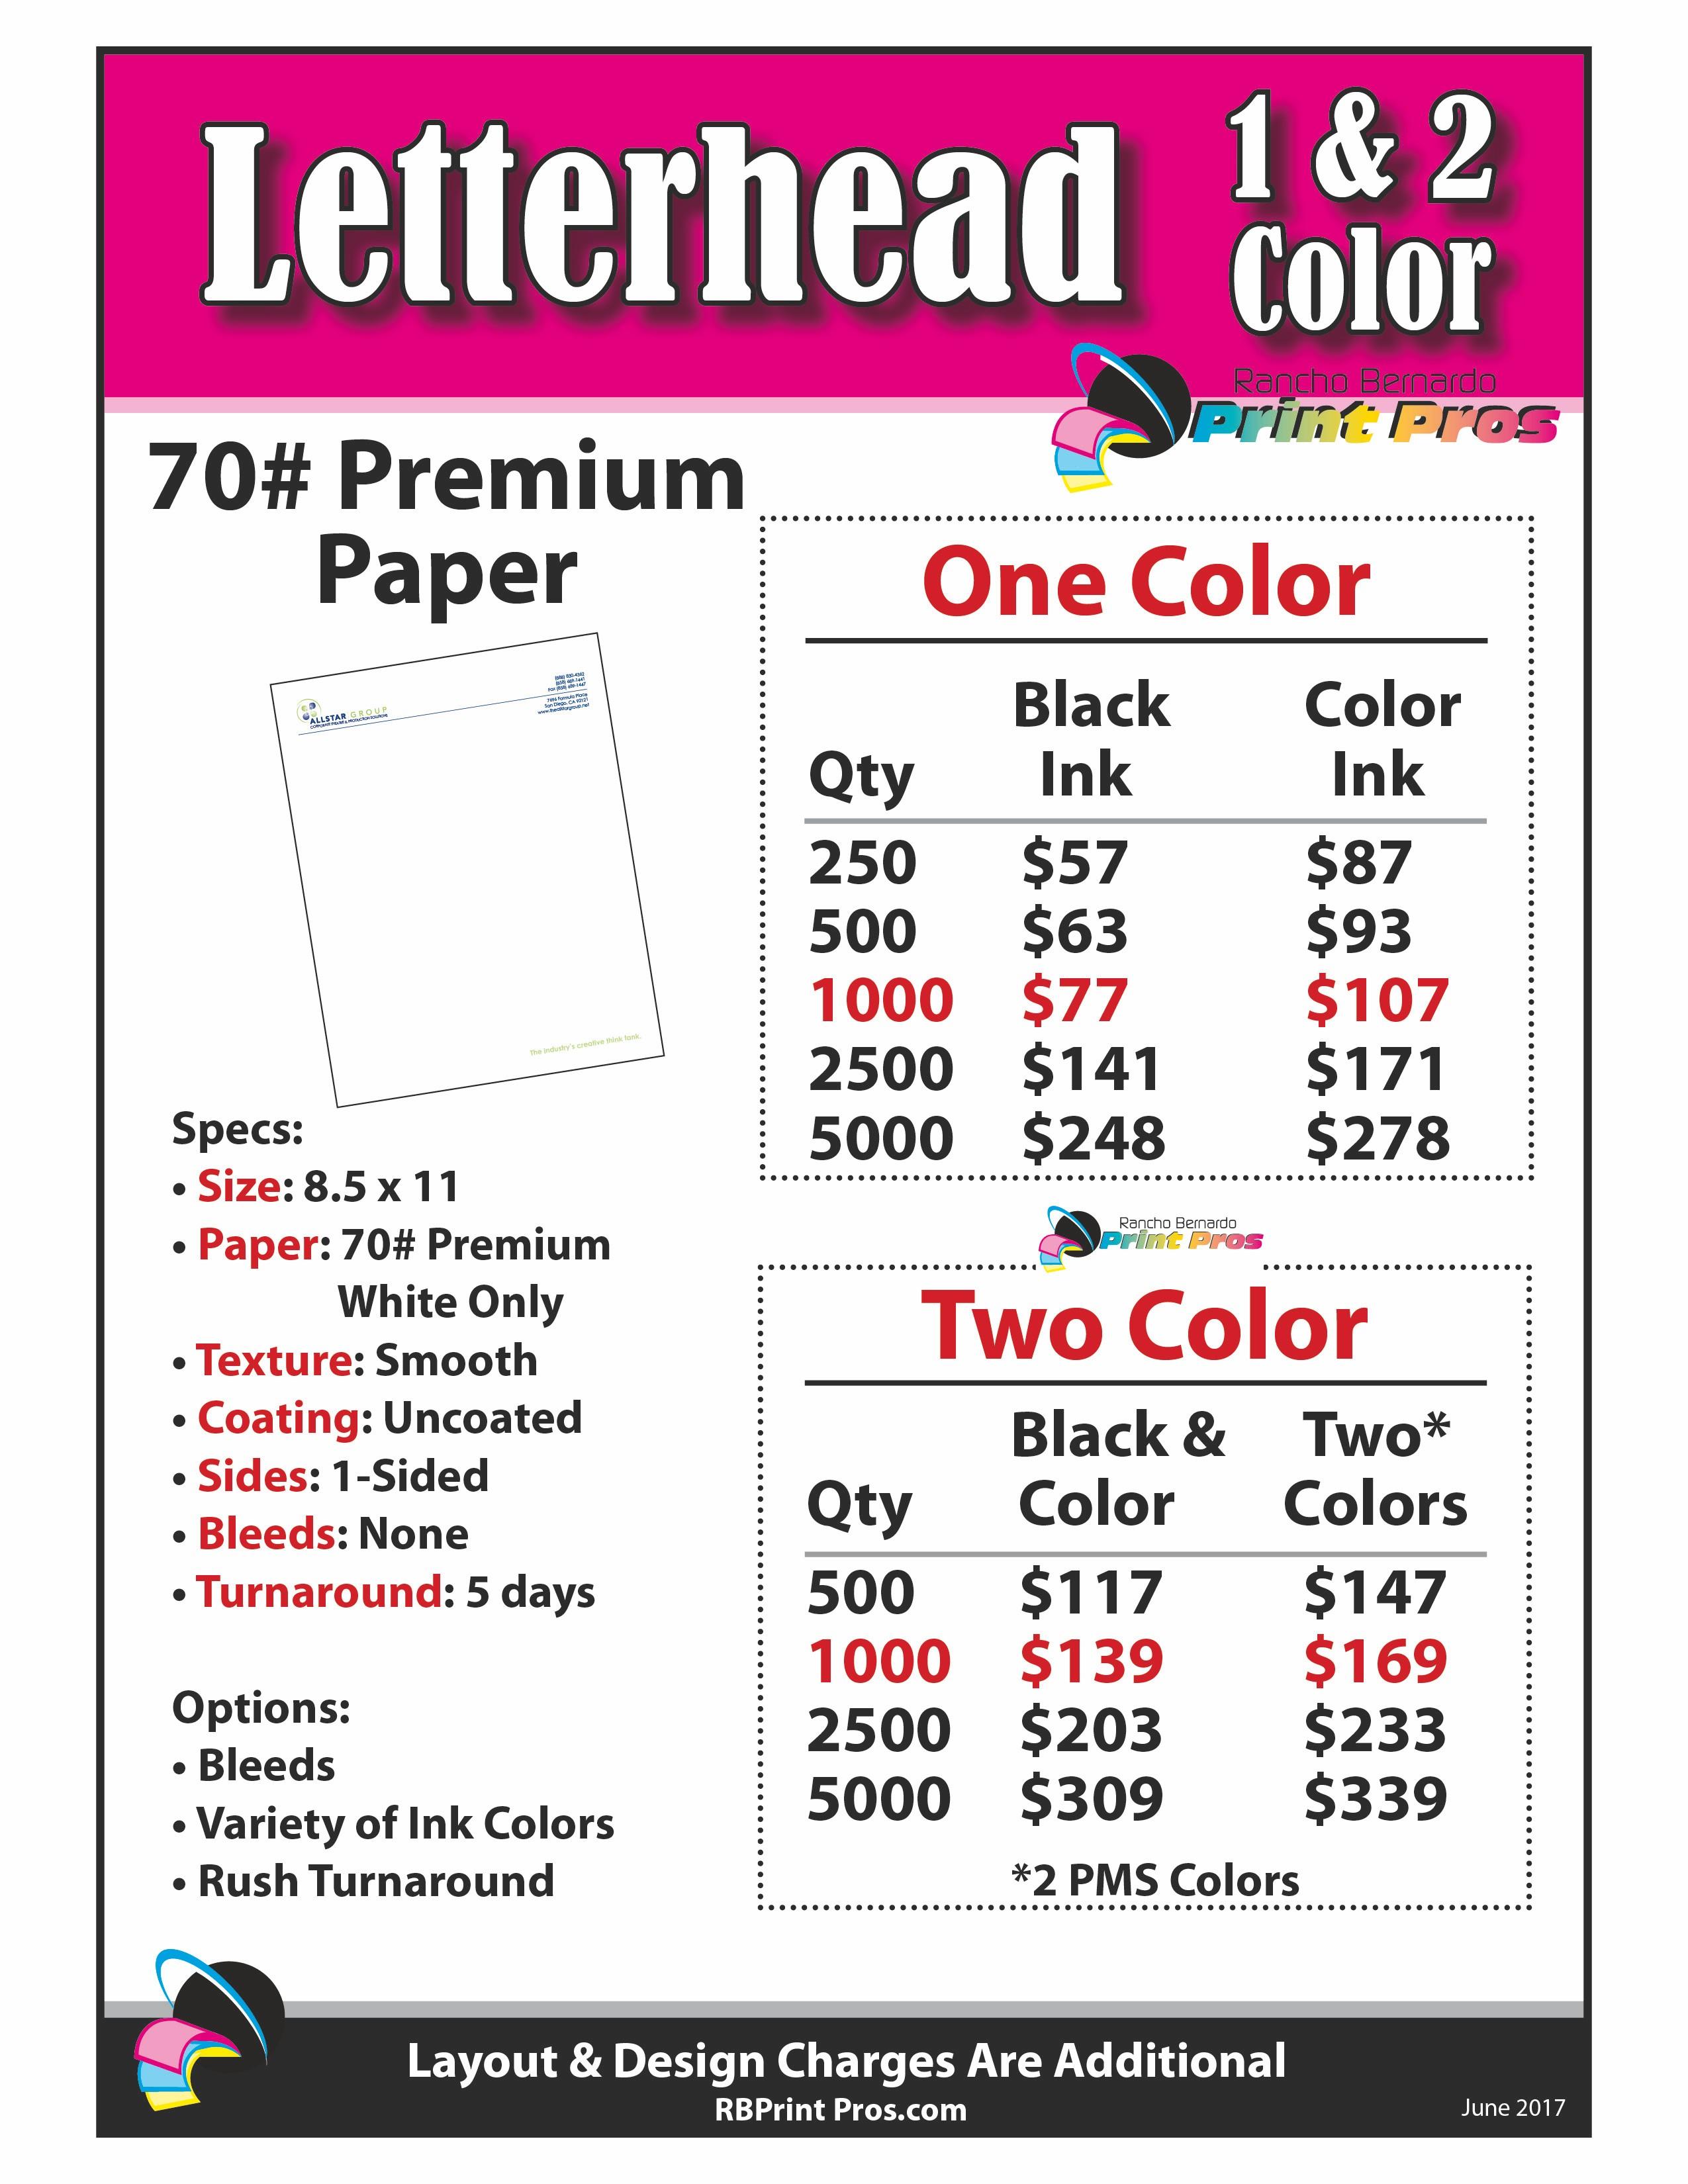 Letterhead: 1&2 Color Basic